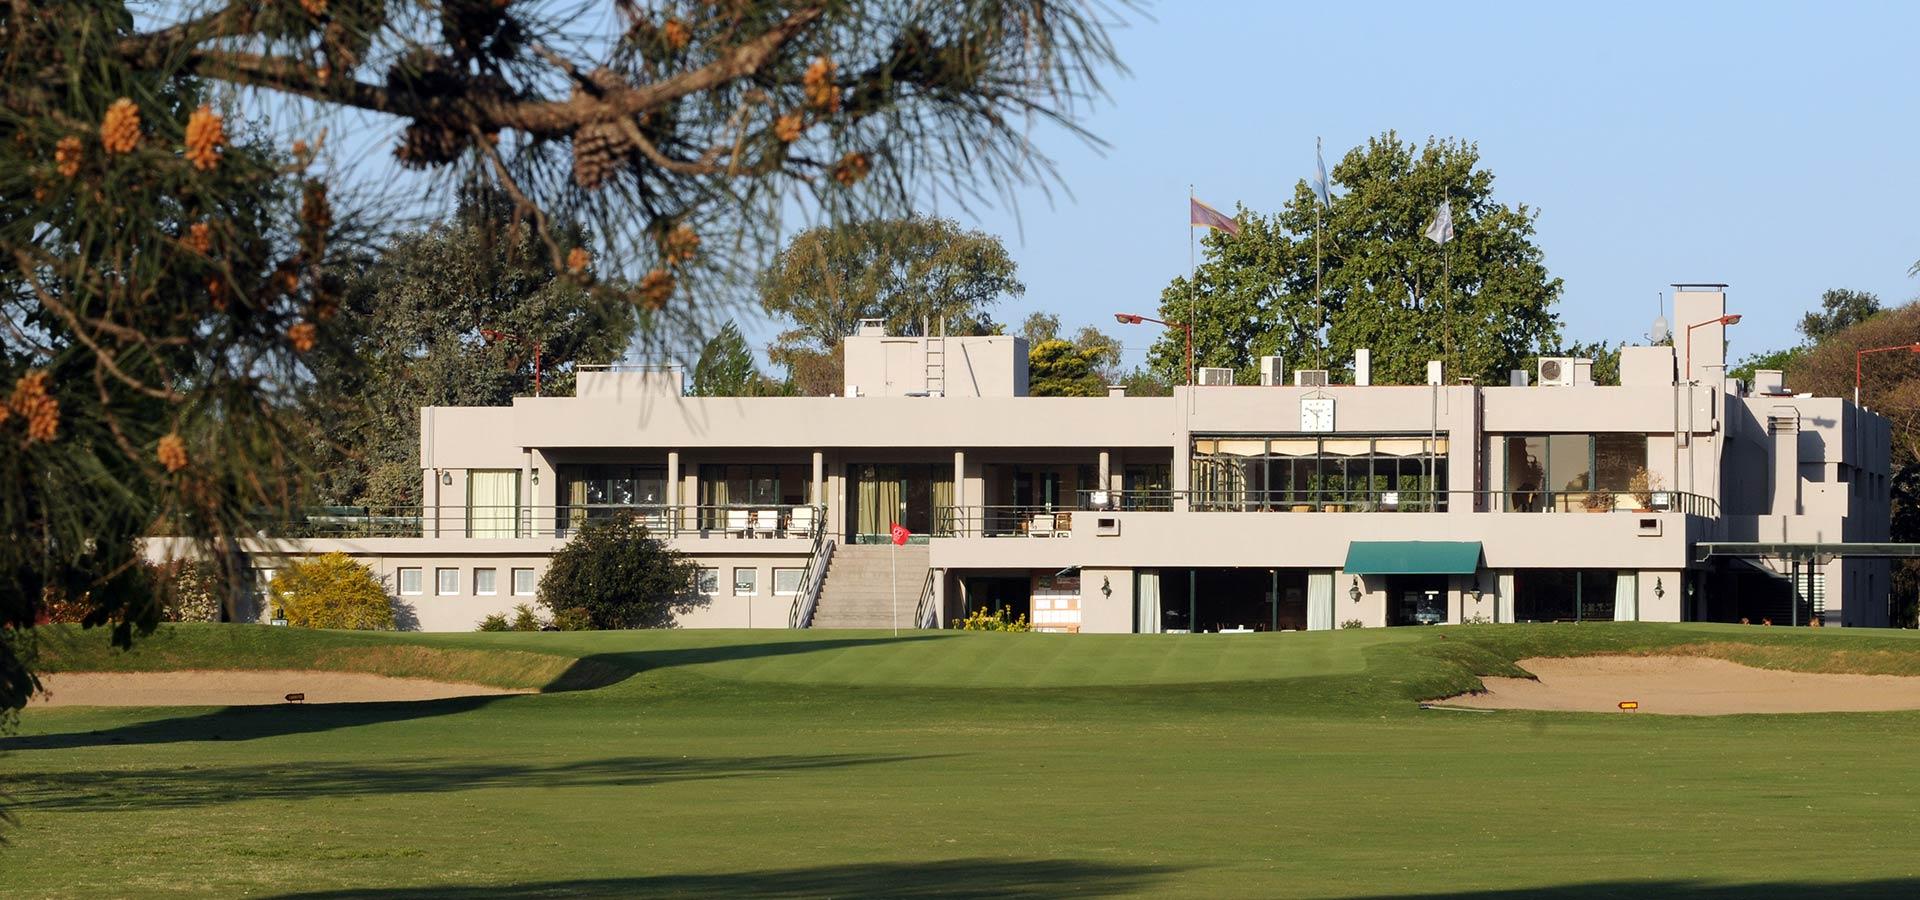 Bienvenido al San Isidro Golf Club